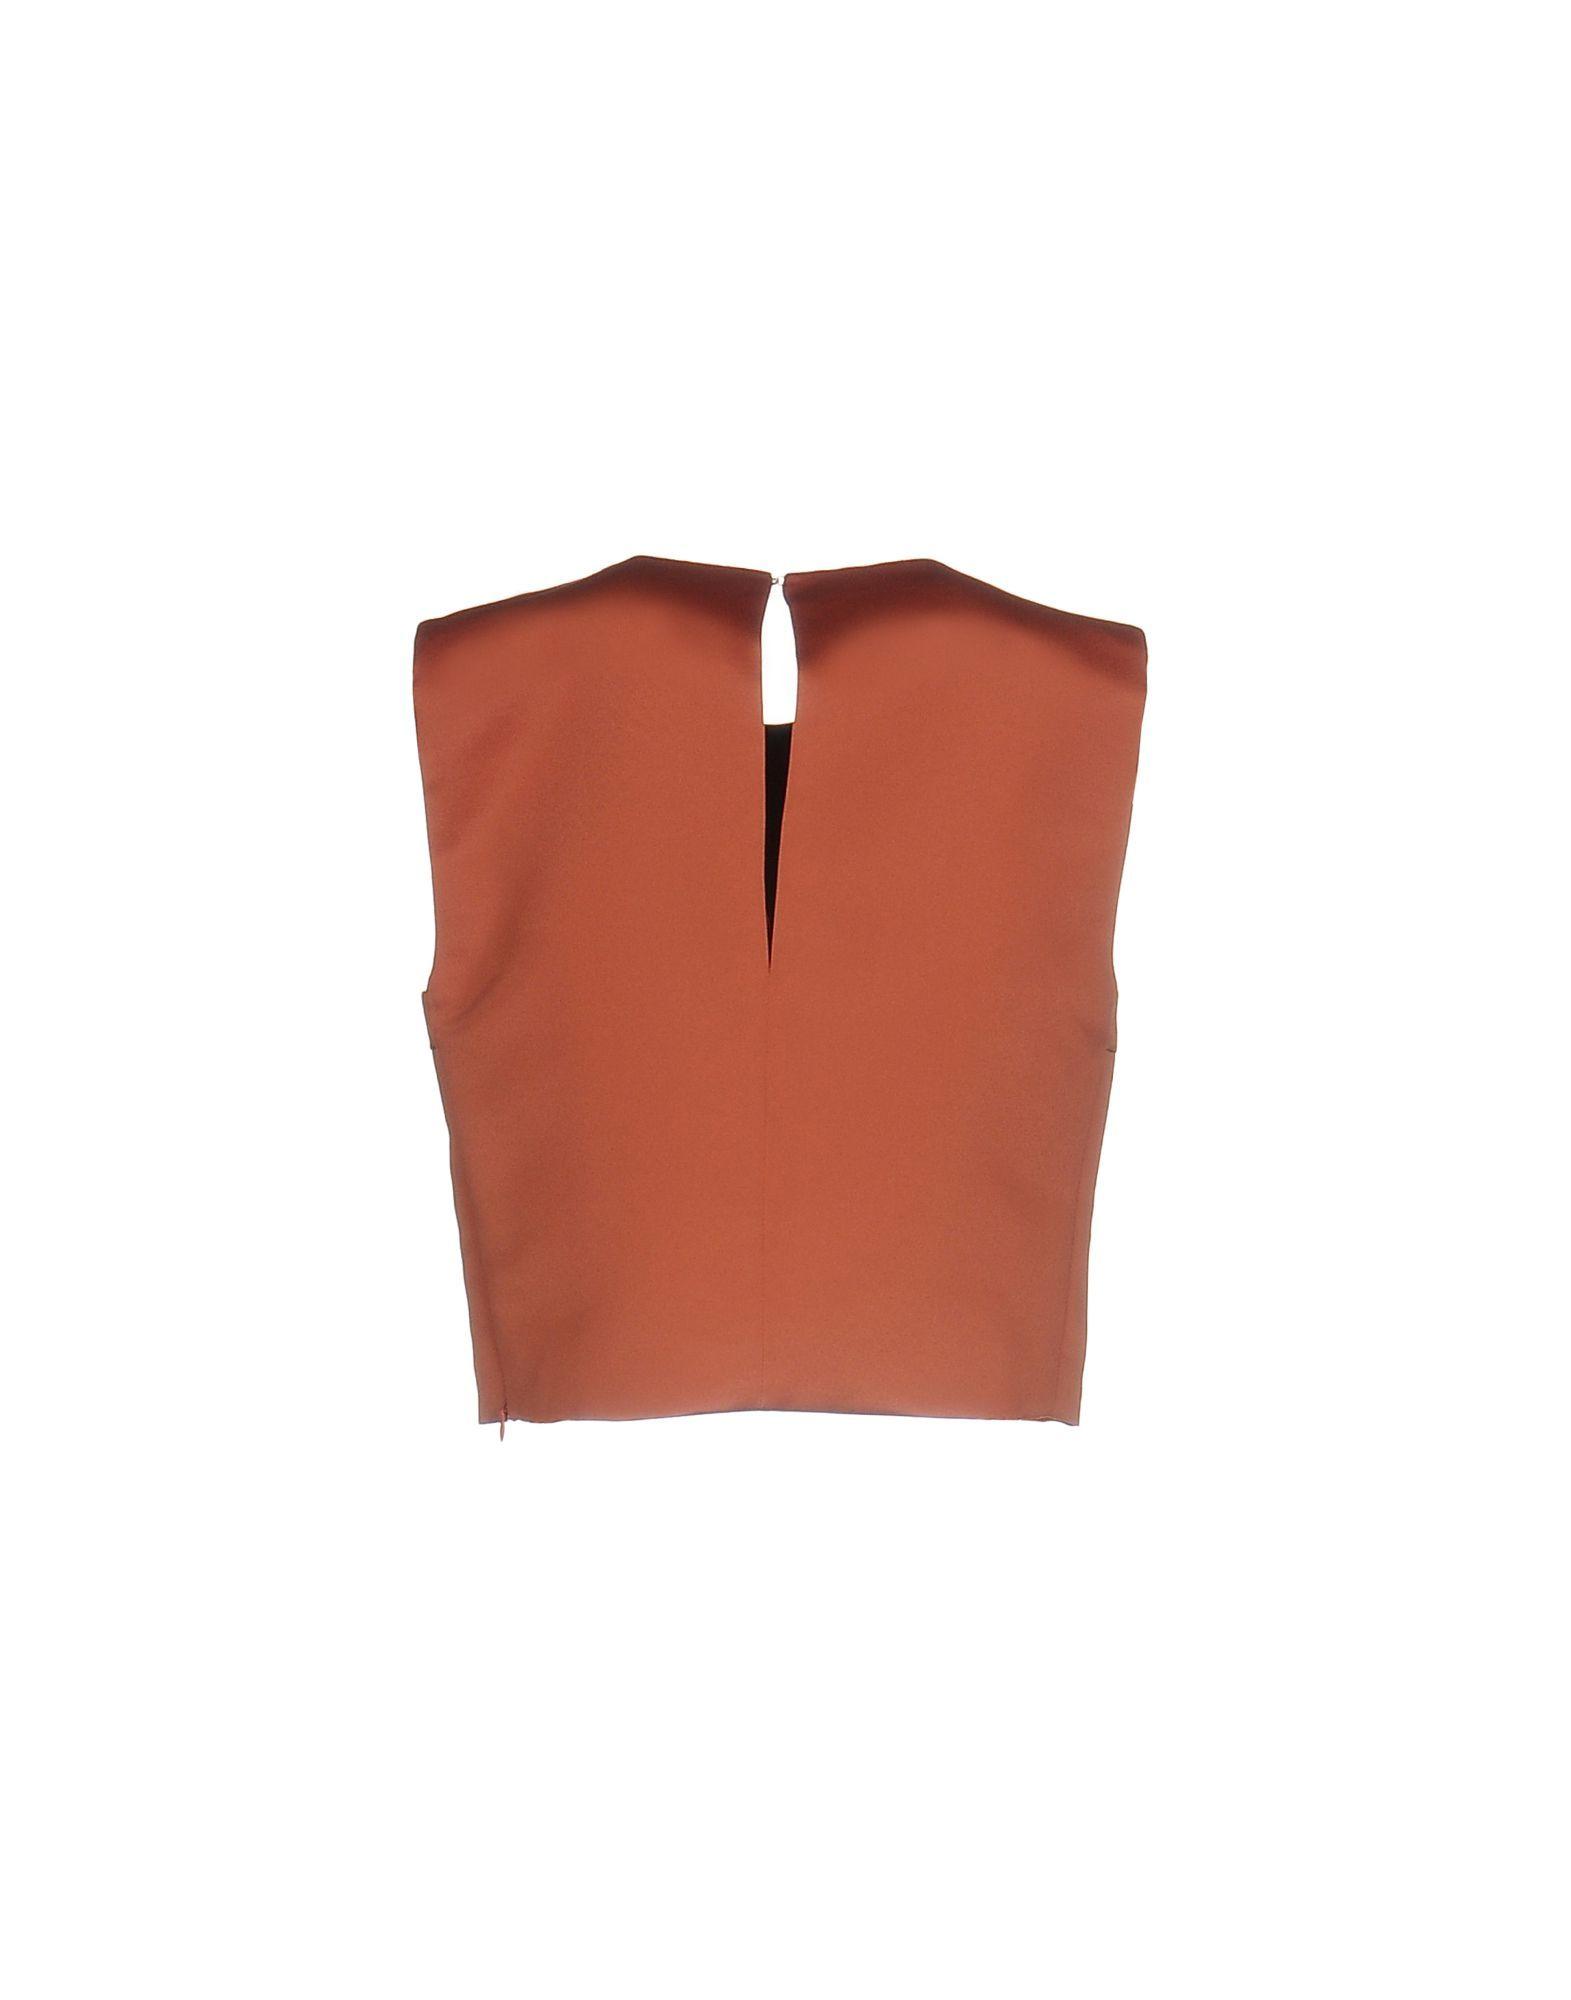 Pinko Rust Cropped Top